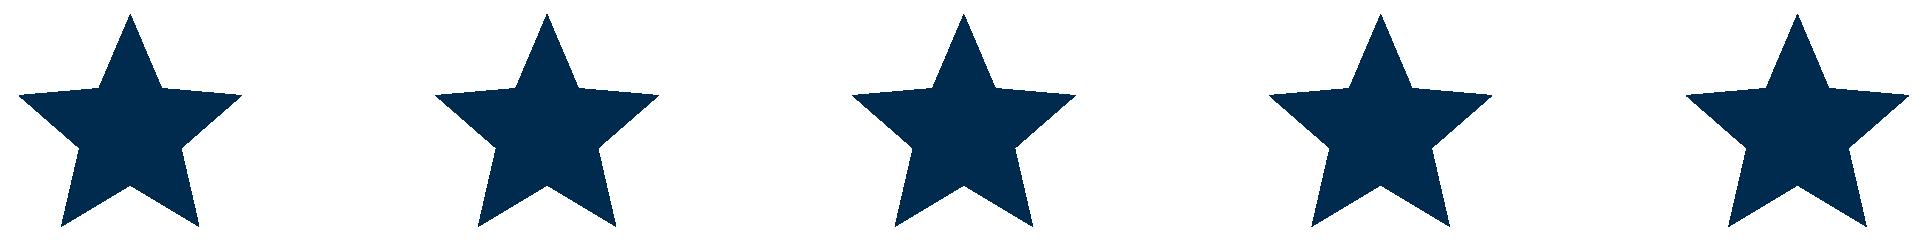 Testimonial_stars